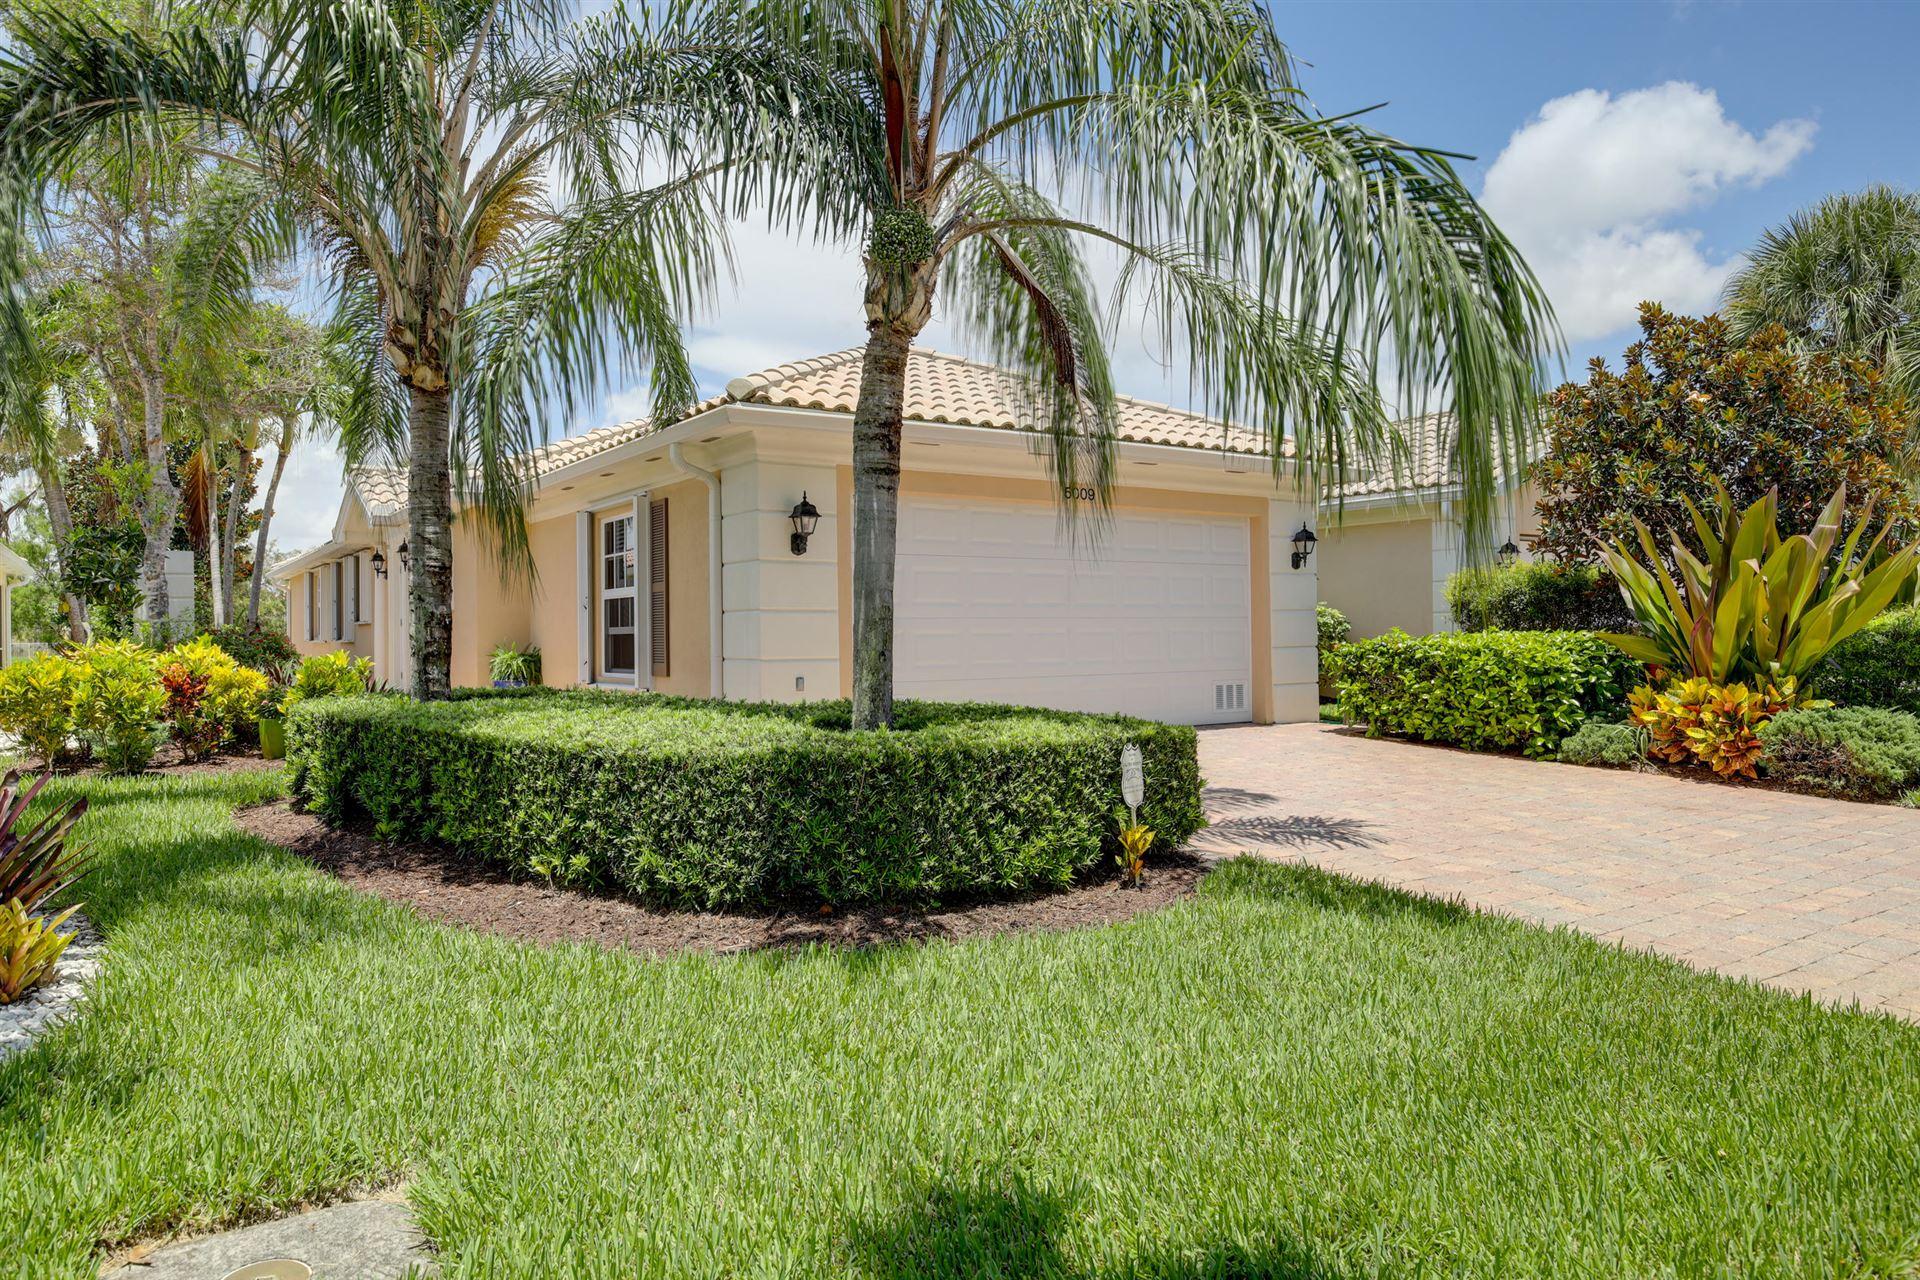 5009 Magnolia Bay Circle, Palm Beach Gardens, FL 33418 - #: RX-10645731